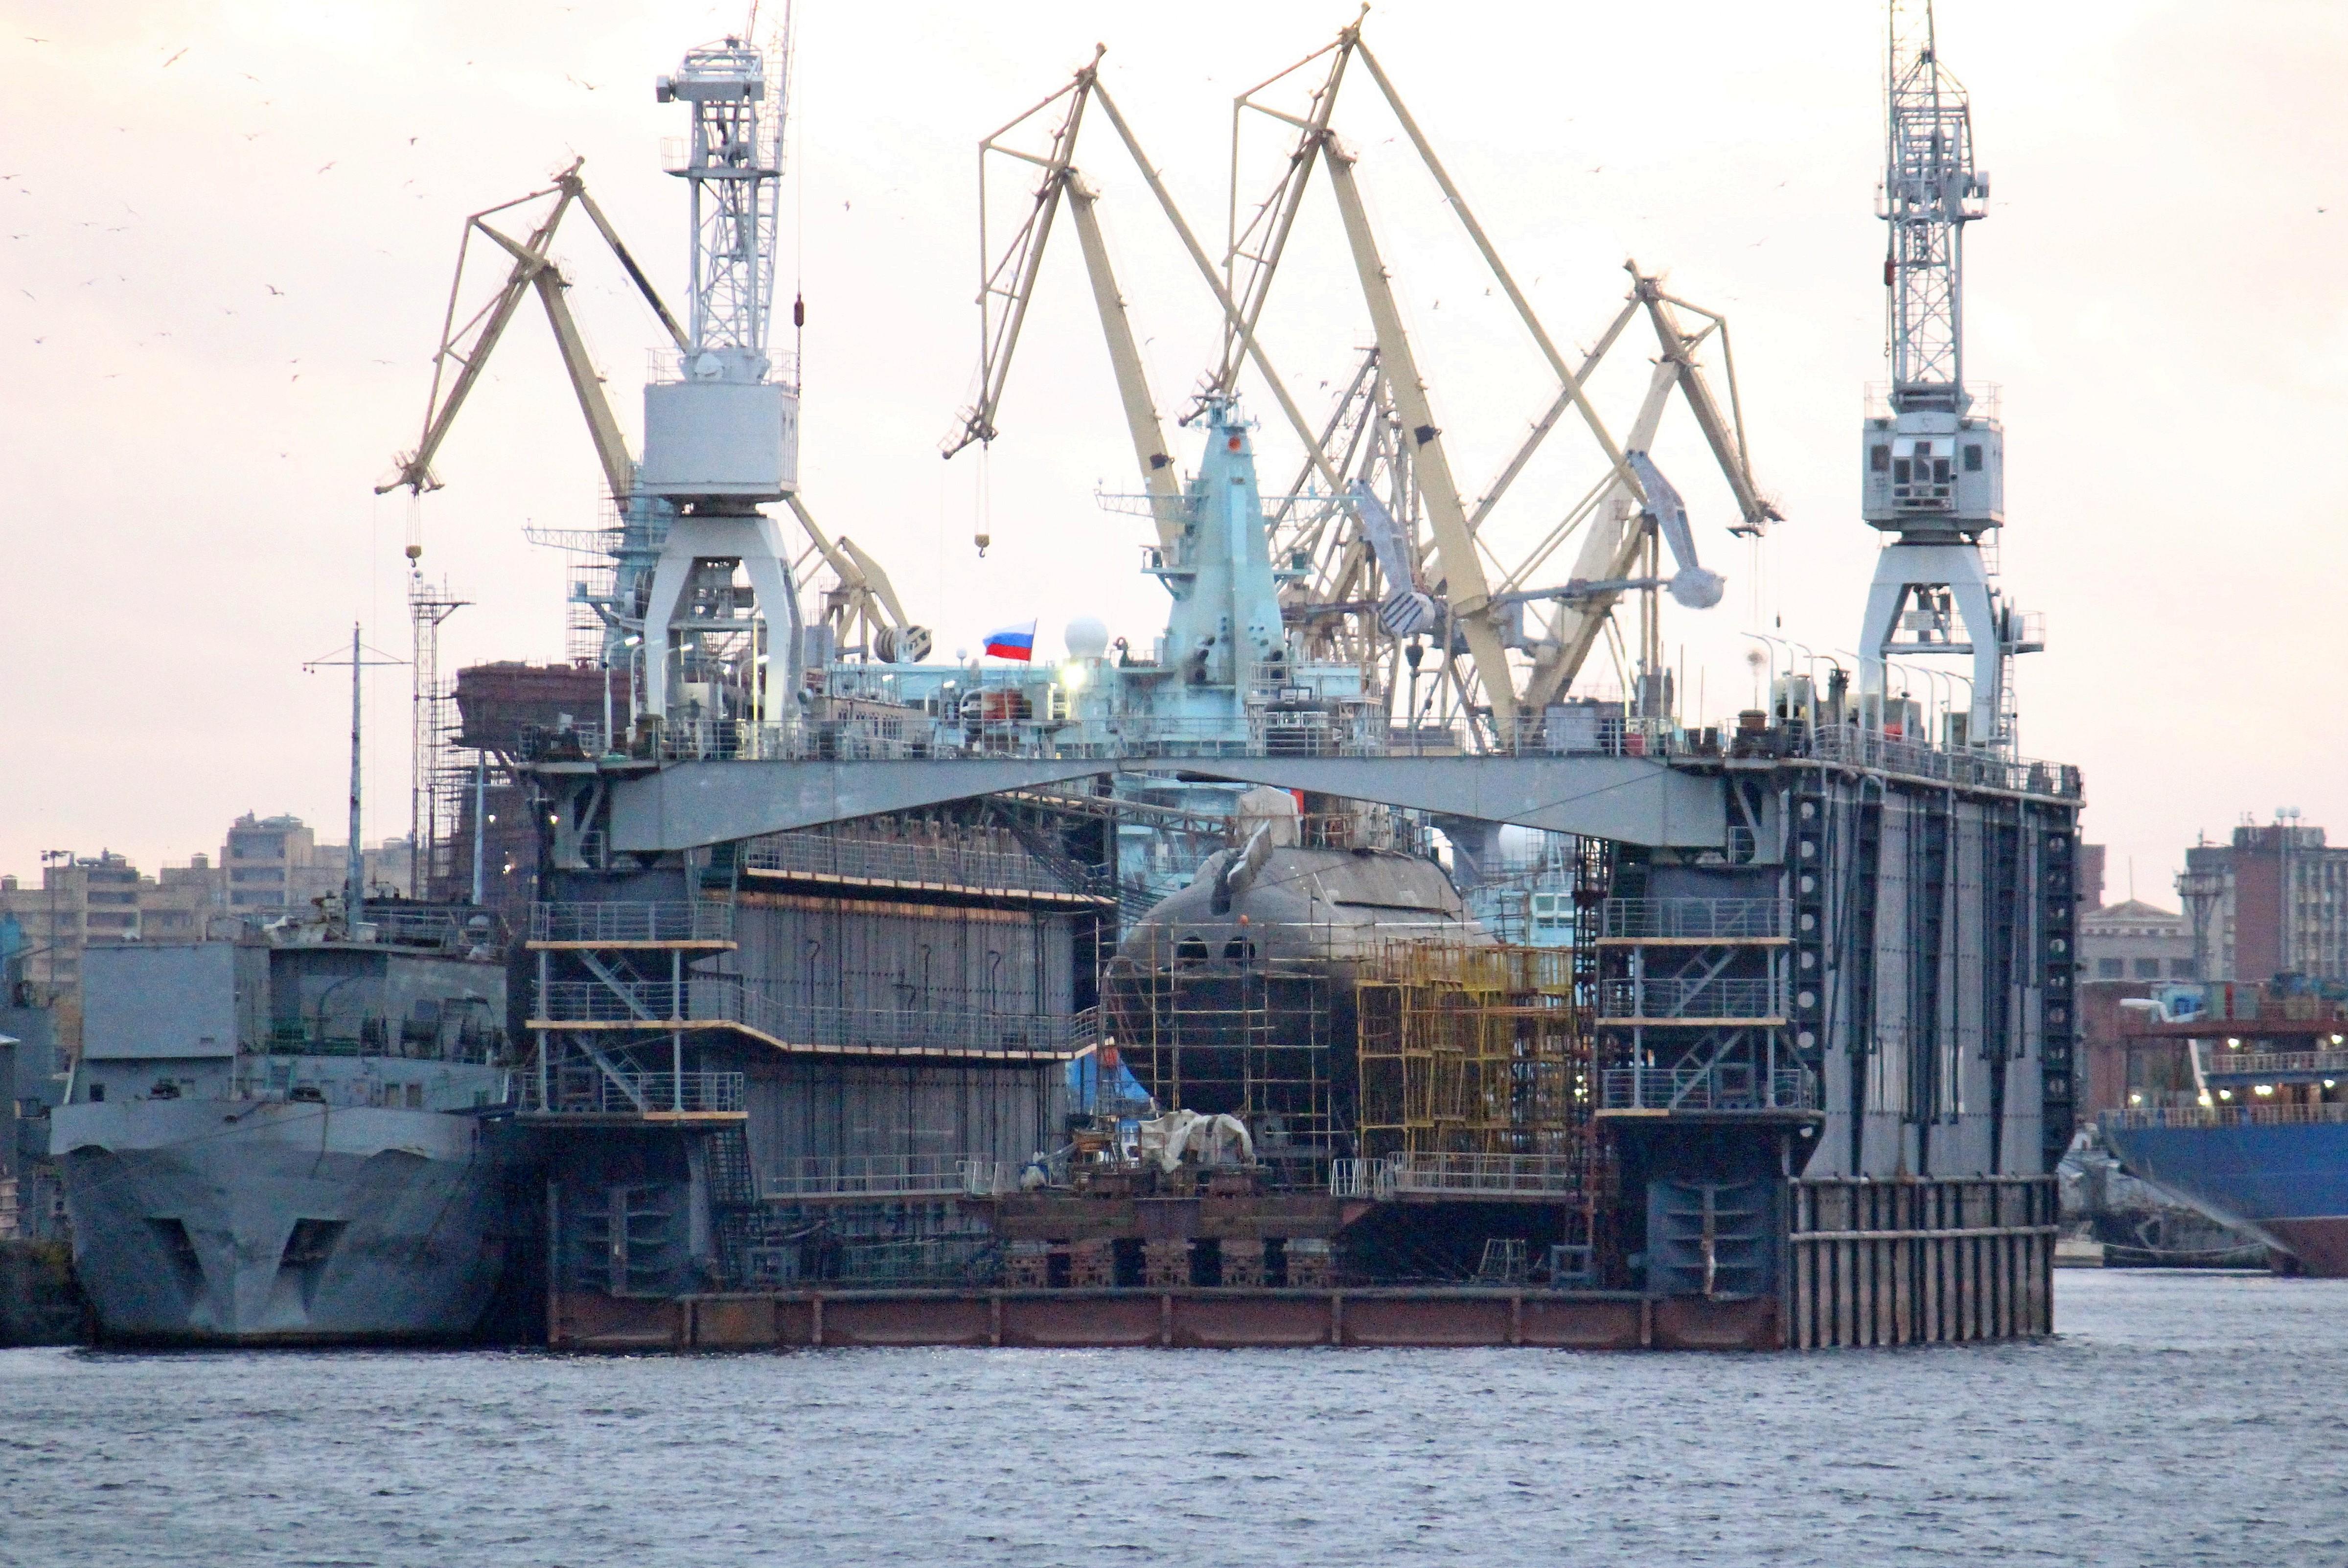 Project 677: Lada/Amur(export) class Submarine - Page 18 23-7981641-677-kronshtadt-av-23.10.2019